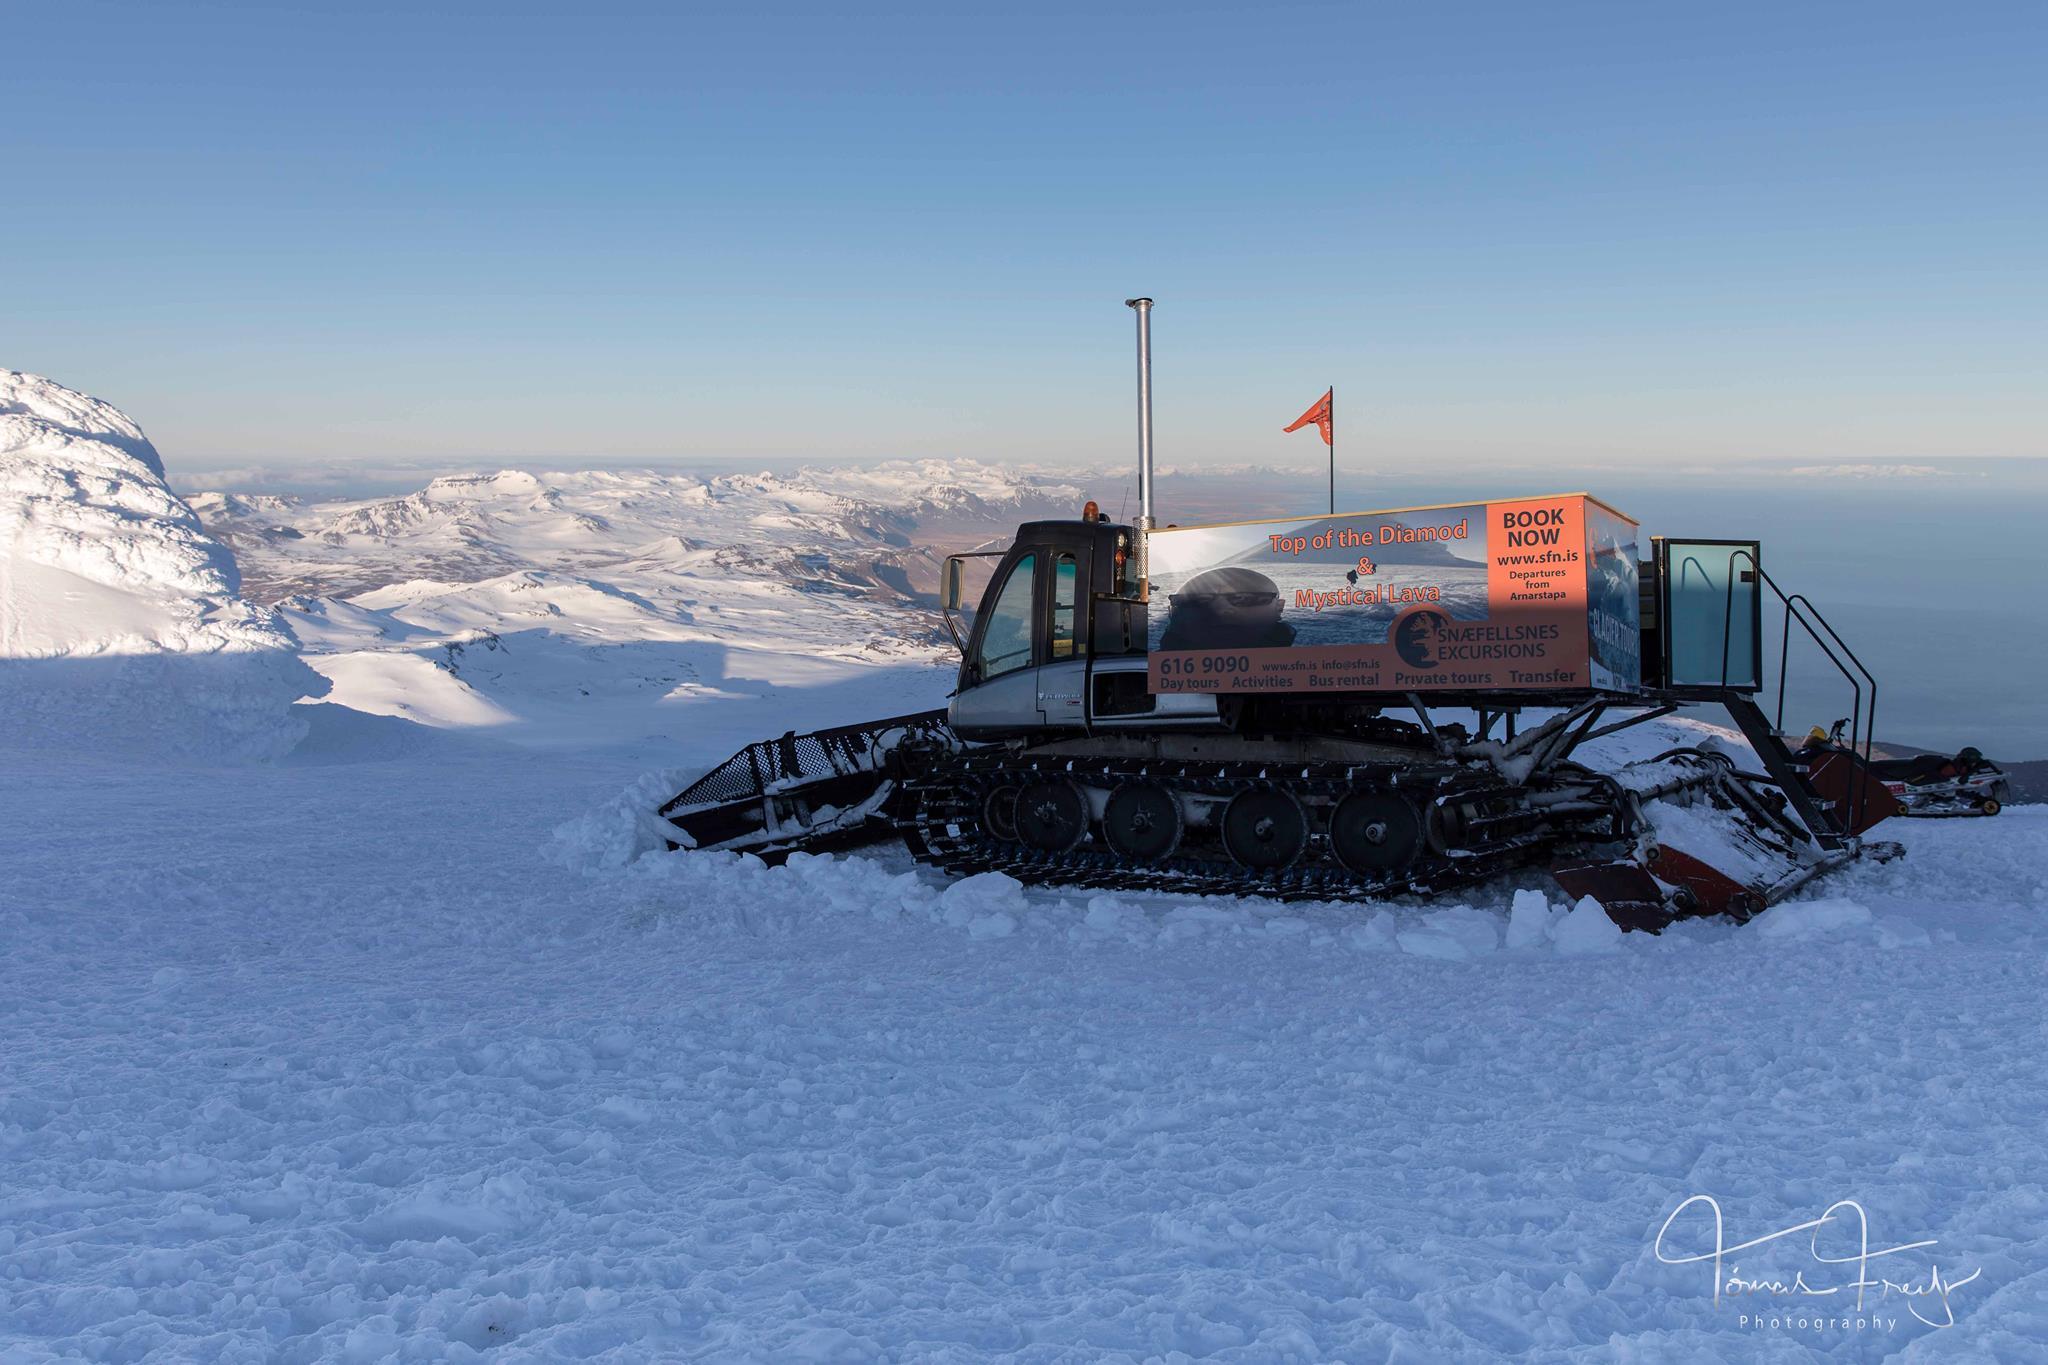 Gatto delle nevi sul ghiacciaio Snaefellsjokull.